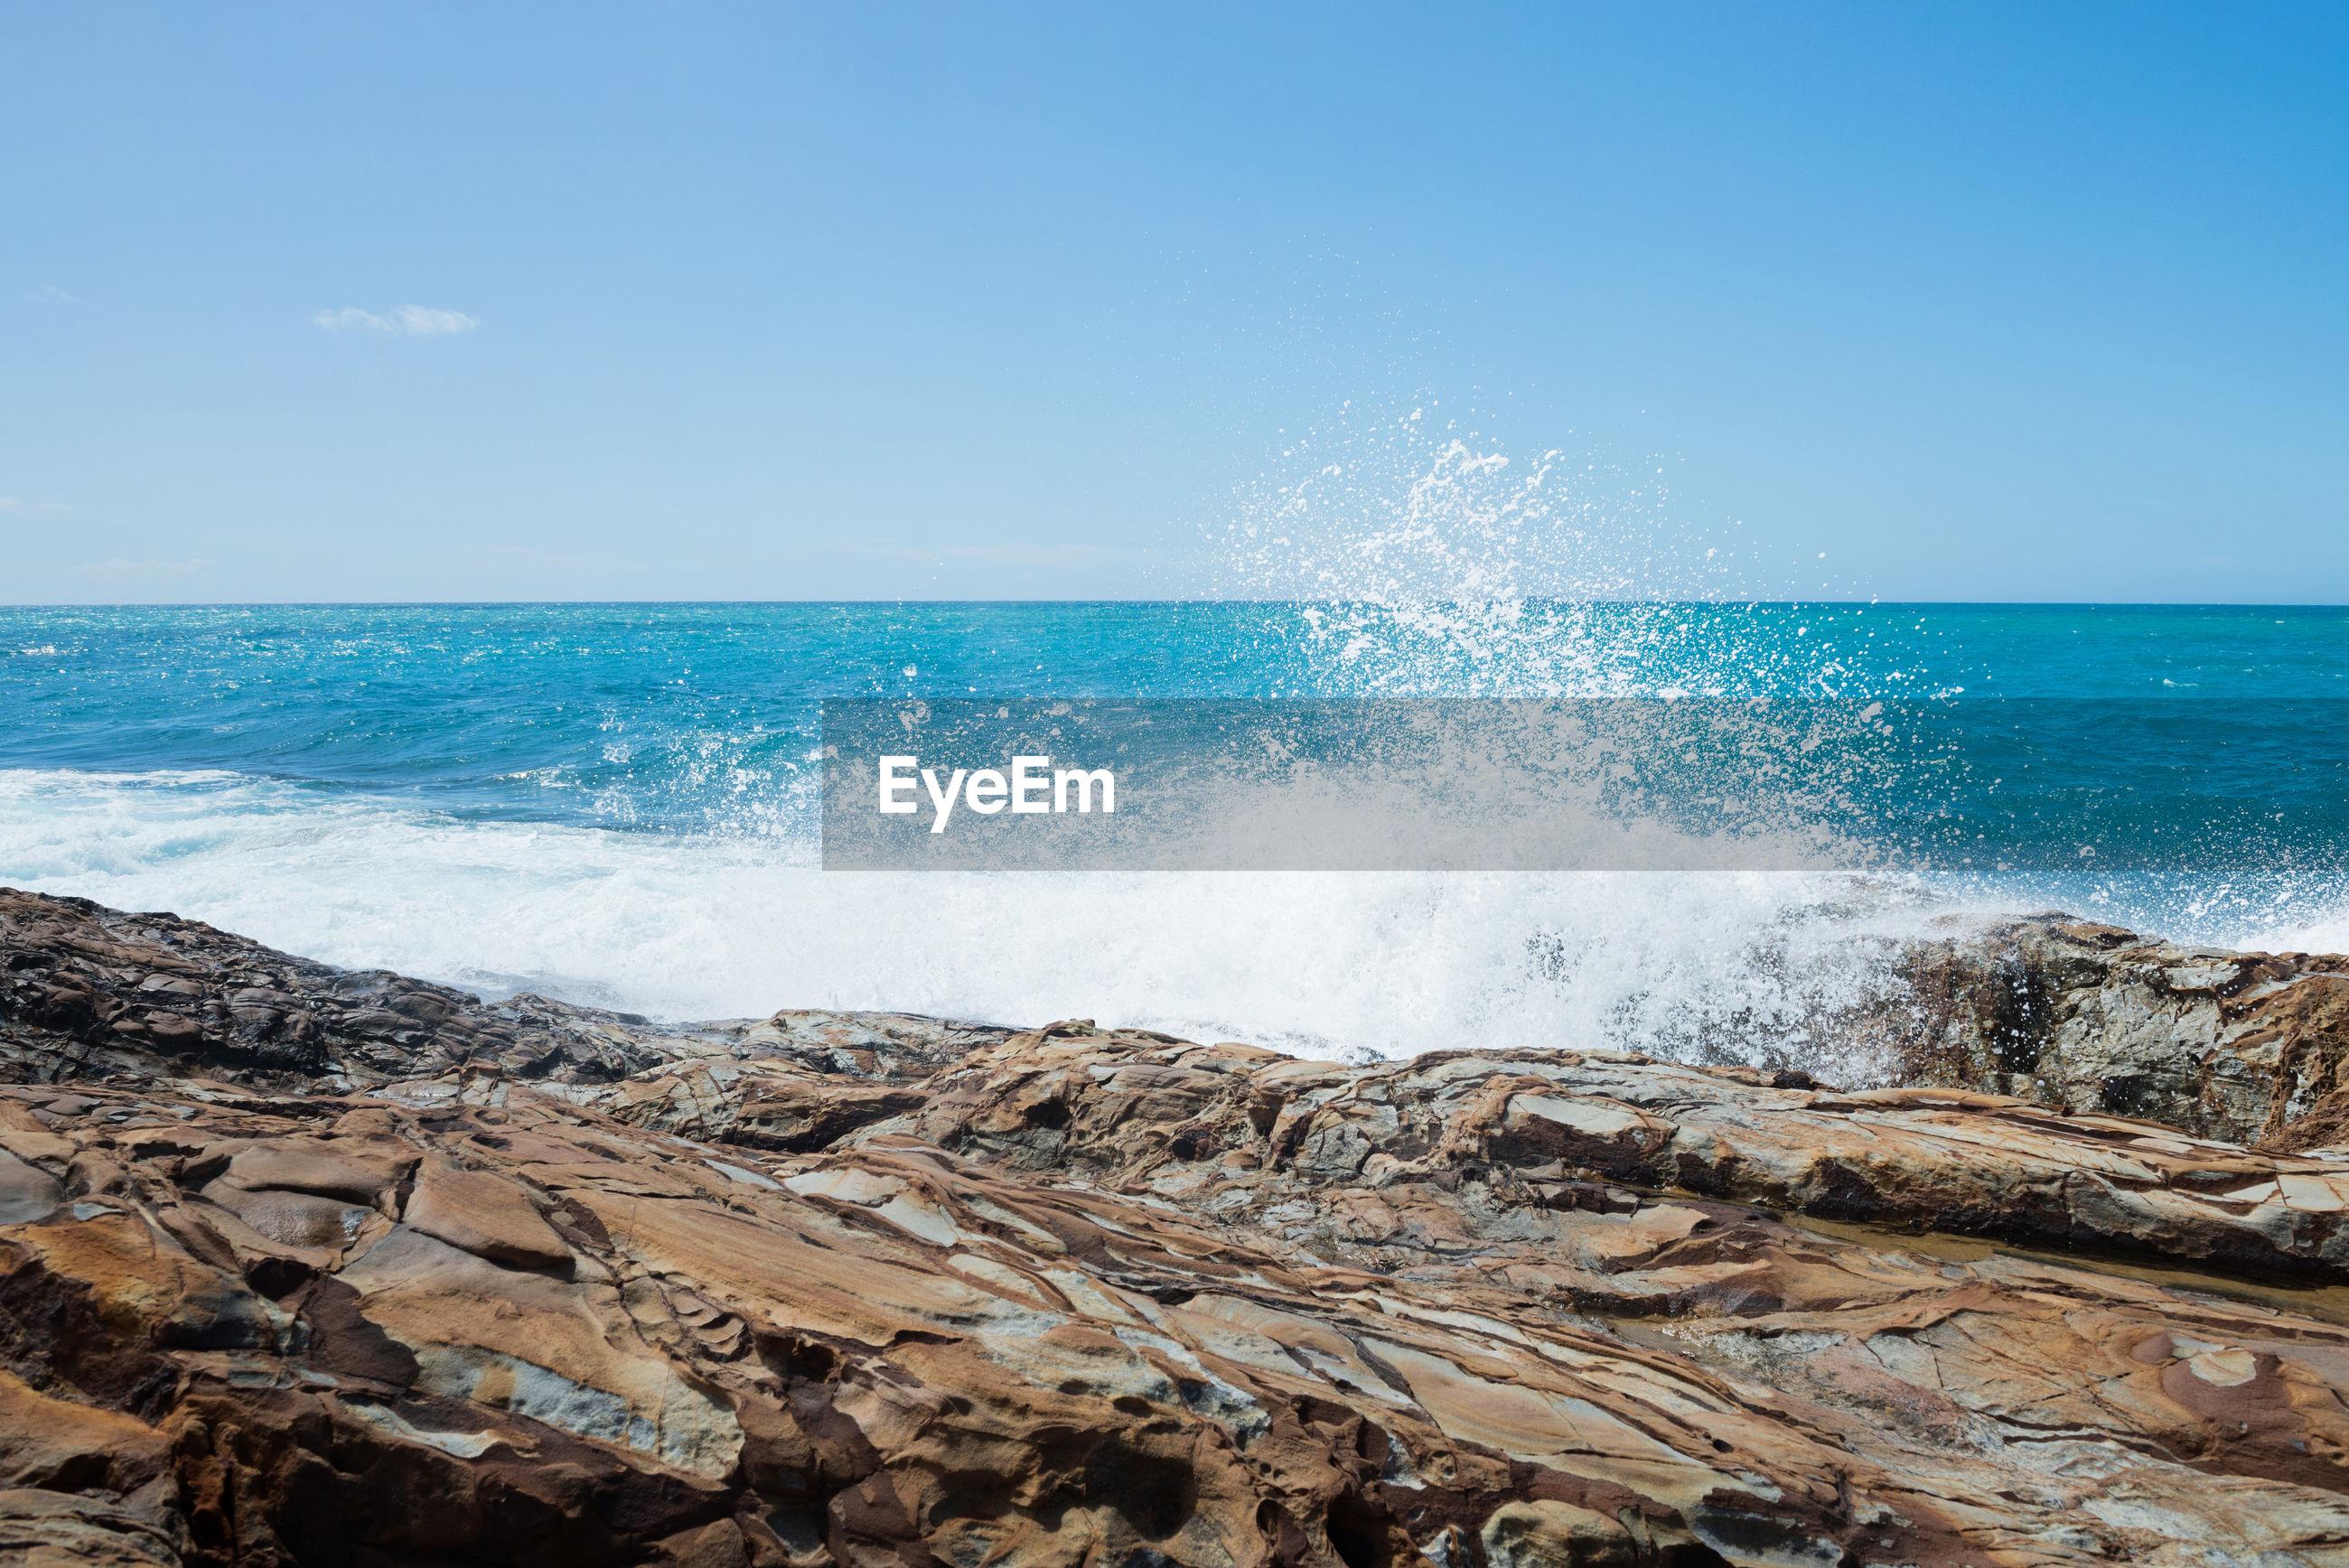 Waves splashing on rocks at shore against blue sky